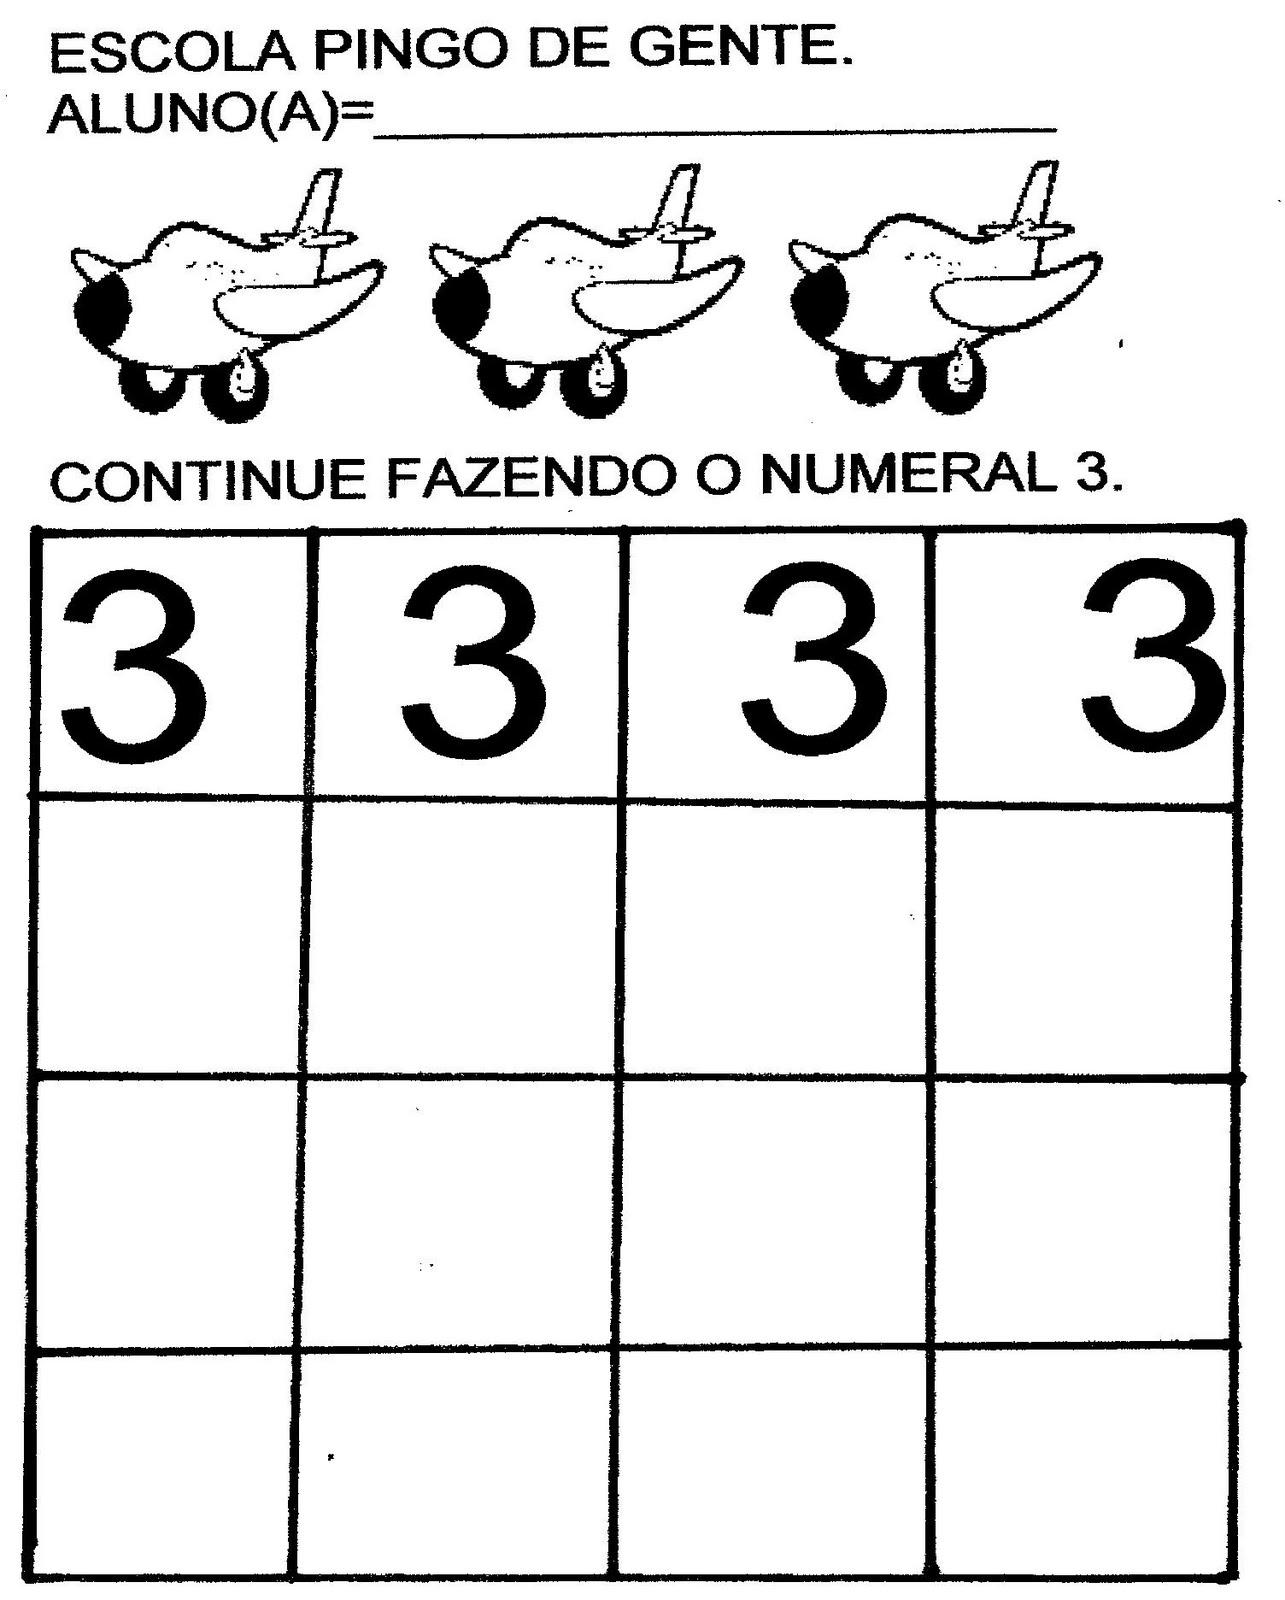 fantastisch numero 10 para colorir aprender ein escrever numeros